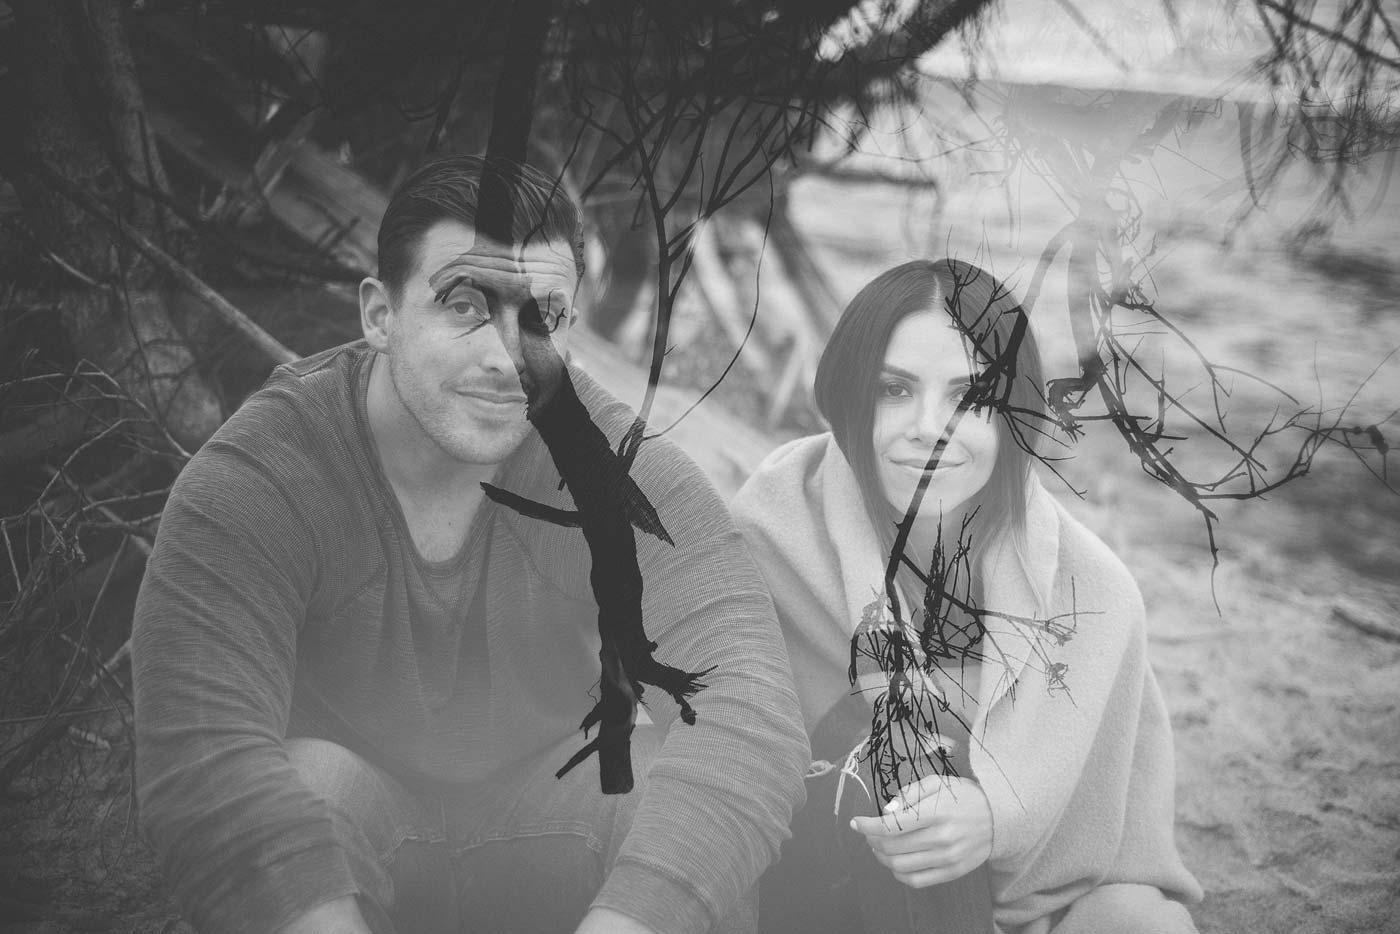 sMalibu-Date-with-Tiffany-and-Nate-413.jpg